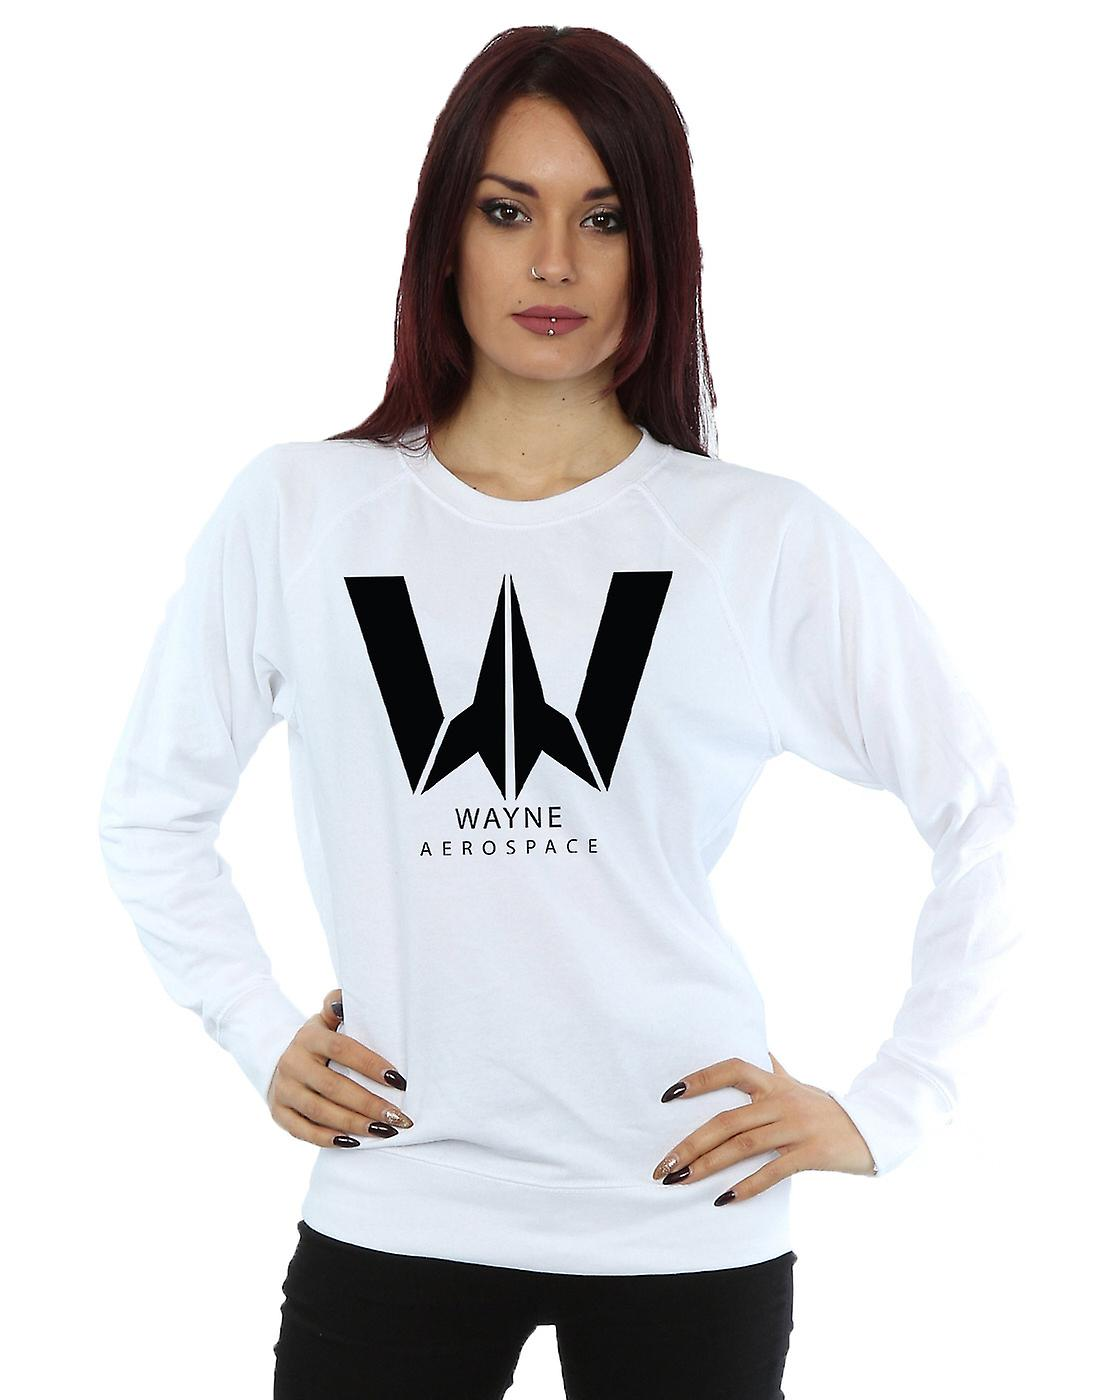 DC Comics Women's Justice League Movie Wayne Aerospace Sweatshirt